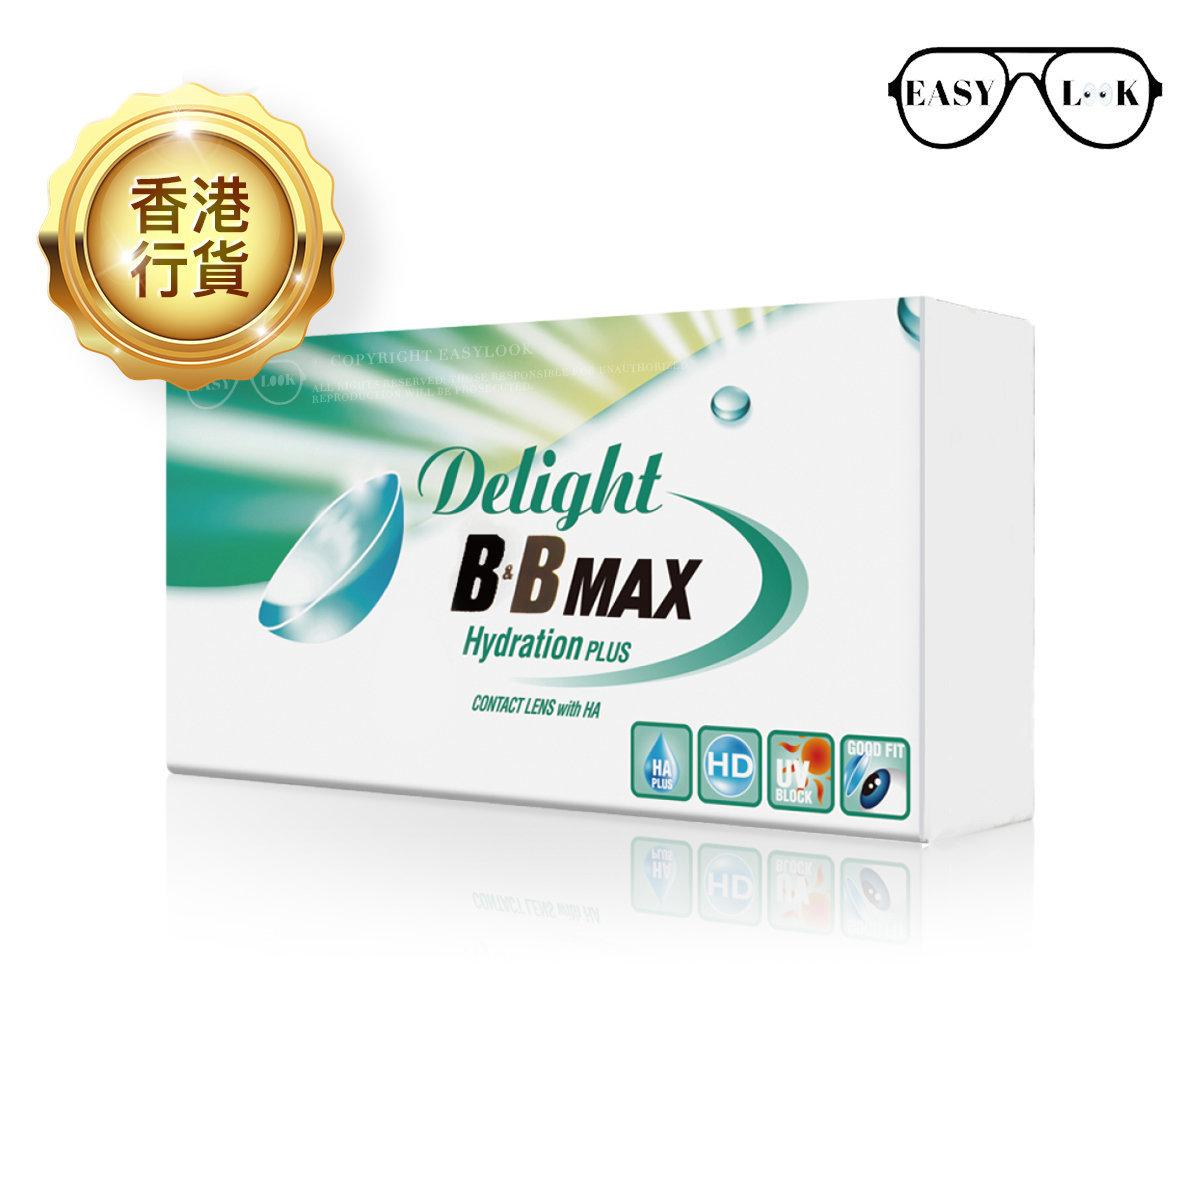 BB Max 黑(Black) 每月拋棄型隱形眼鏡 (弧度: 8.6, 度數: -0.00)